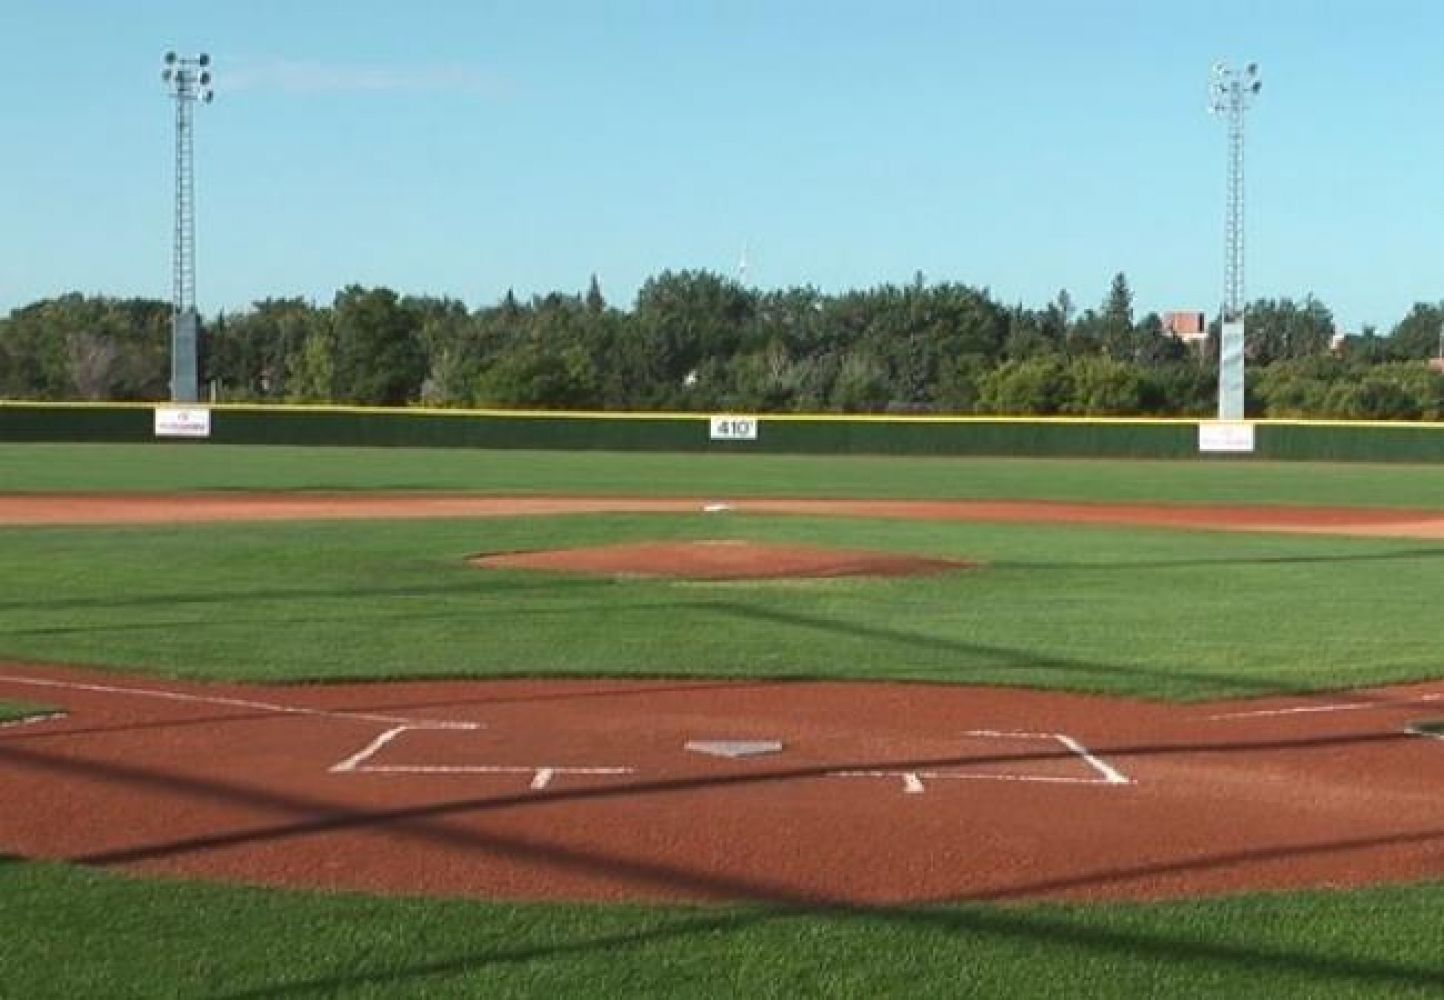 Information on Park Opening, 2019 Optimist Jr Baseball League